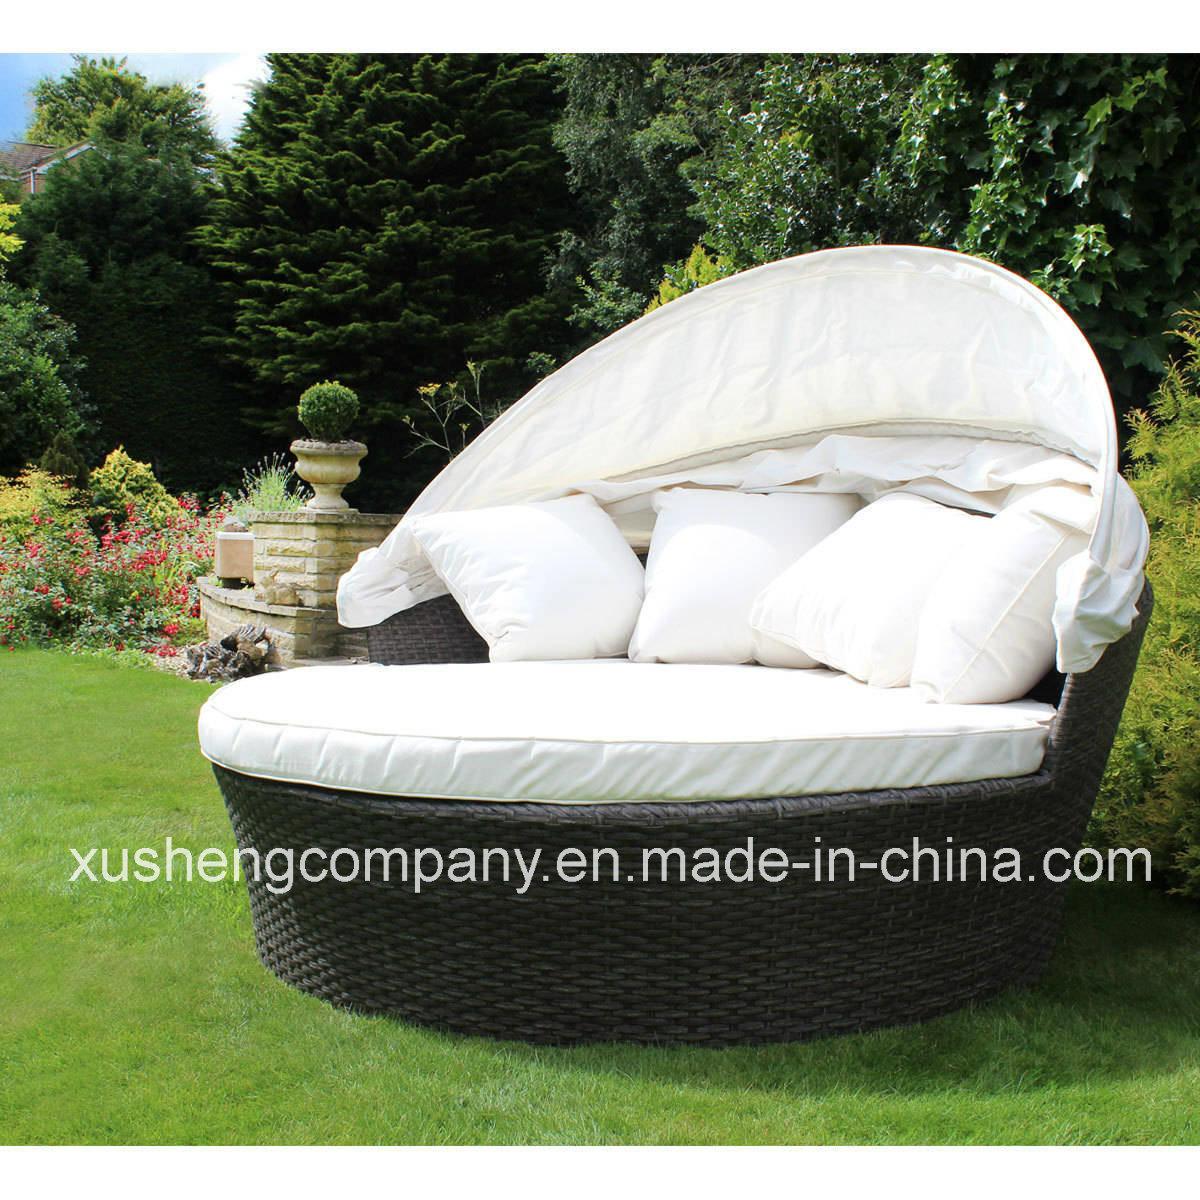 Groovy China Bentley Garden Luxury Rattanm Day Bed Photos Evergreenethics Interior Chair Design Evergreenethicsorg